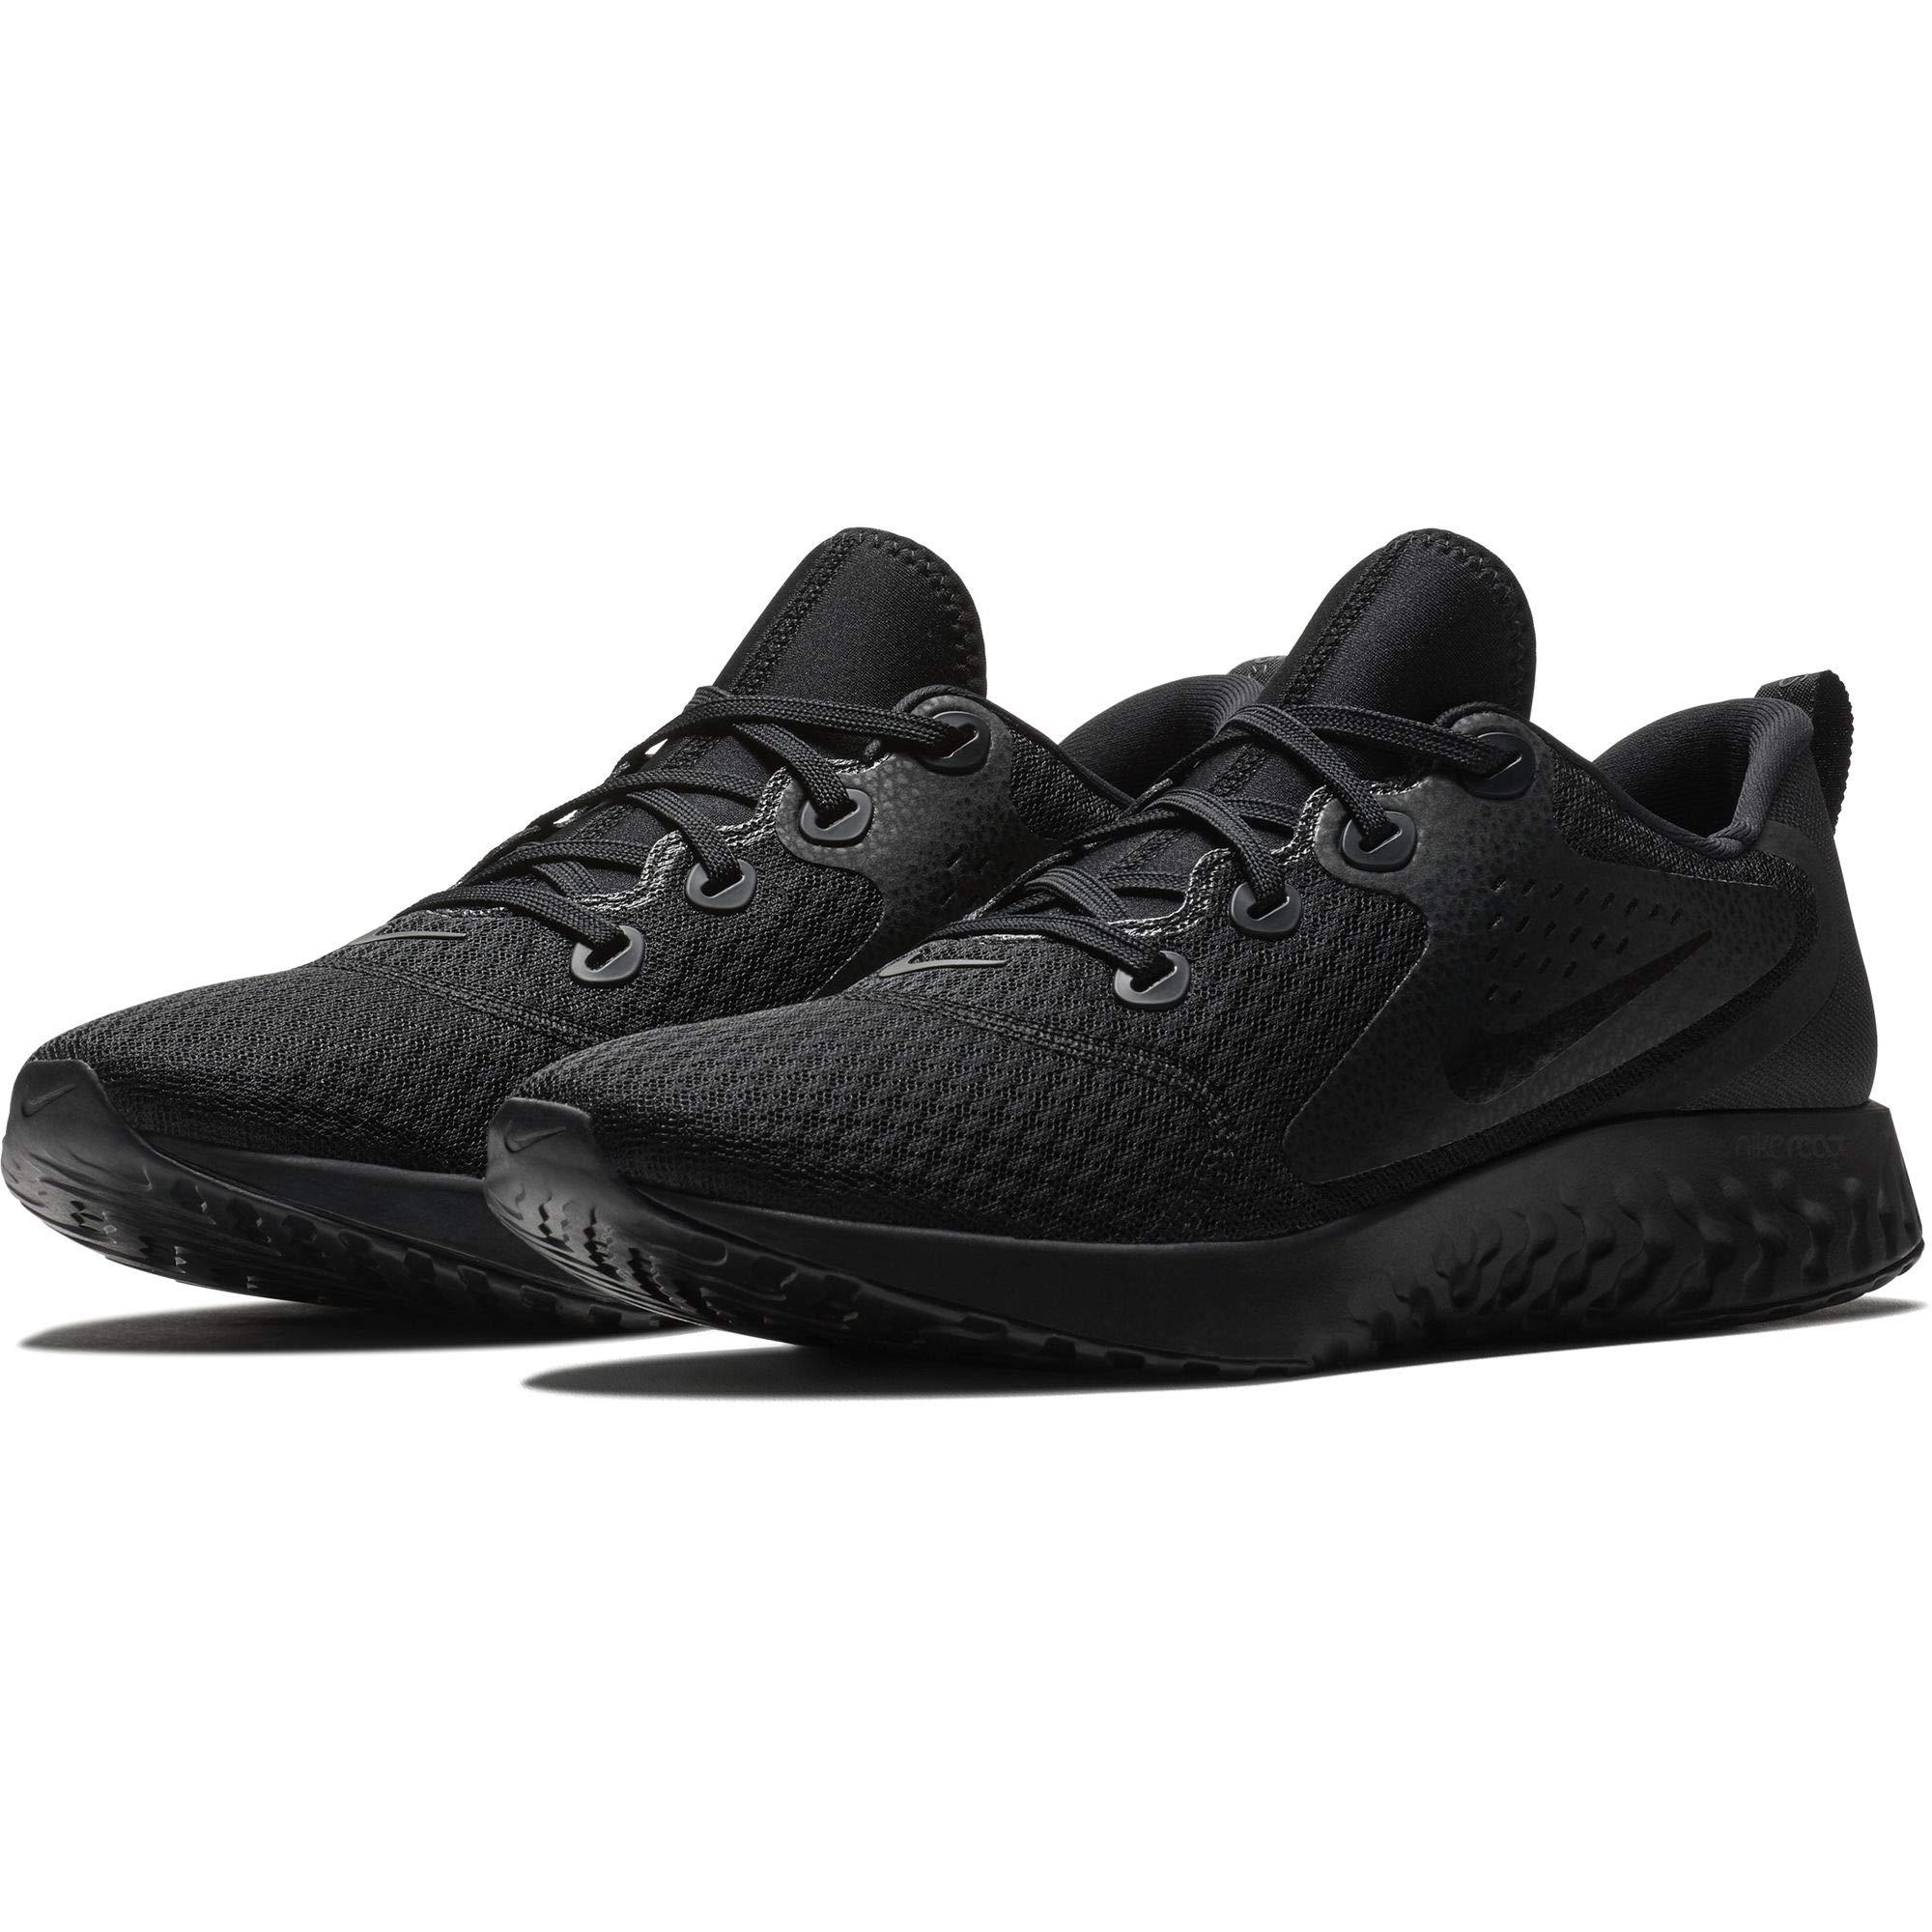 NIKE Men's Legend React Running Shoe Black Size 12 D US by NIKE